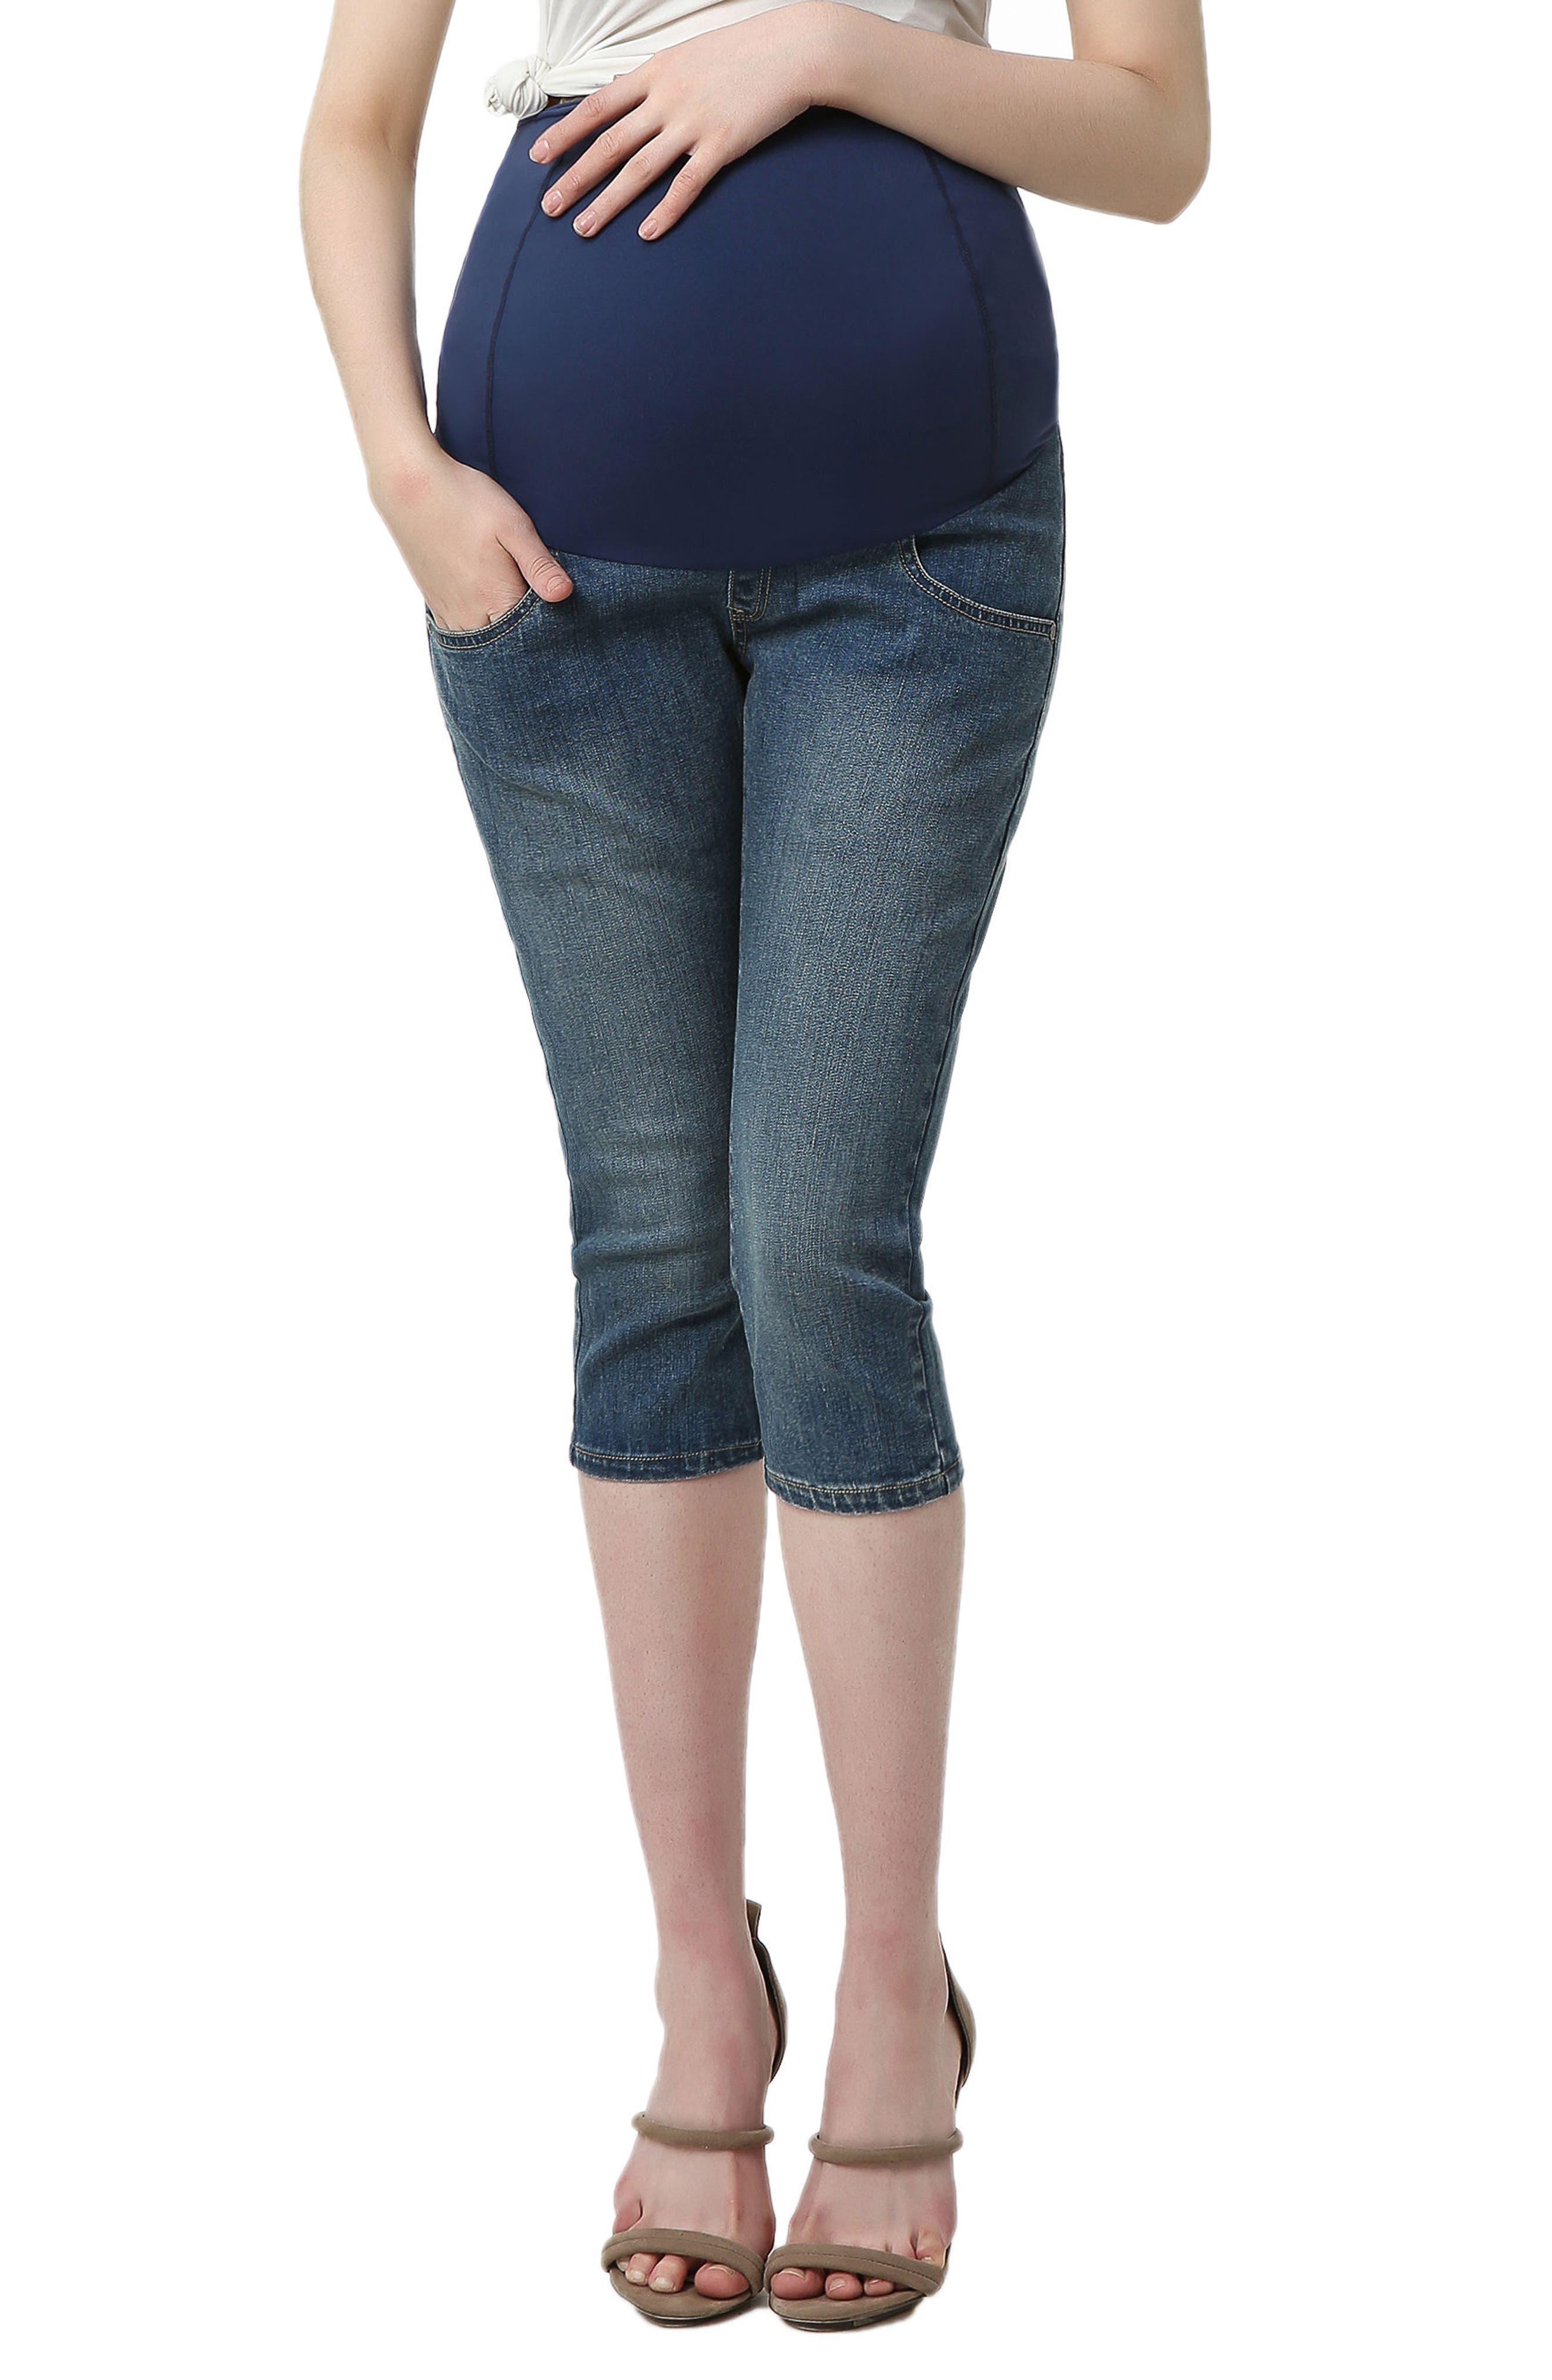 Kimi and Kai Courtney Capri Maternity Skinny Jeans